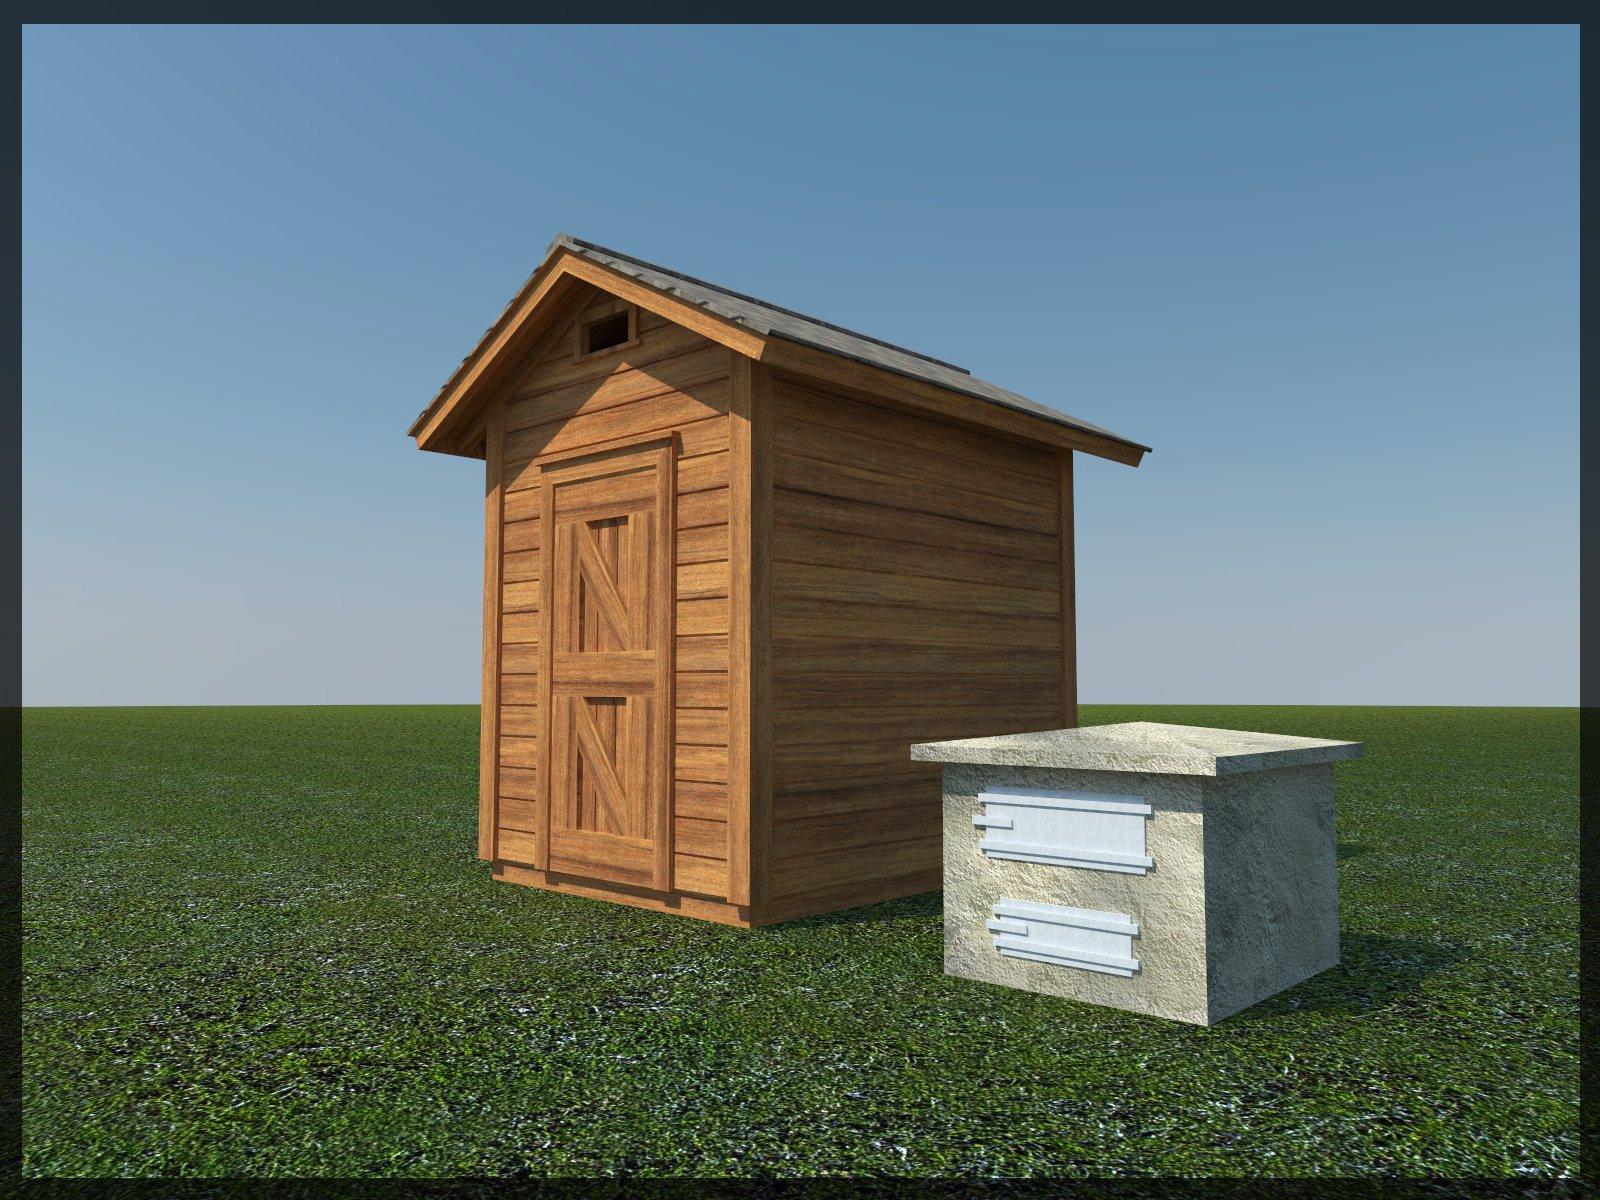 Smokehouse Plans 8' x 6' Smoker Smoke House Building Plan Build Your Own DIY by DIY Plans (Image #3)